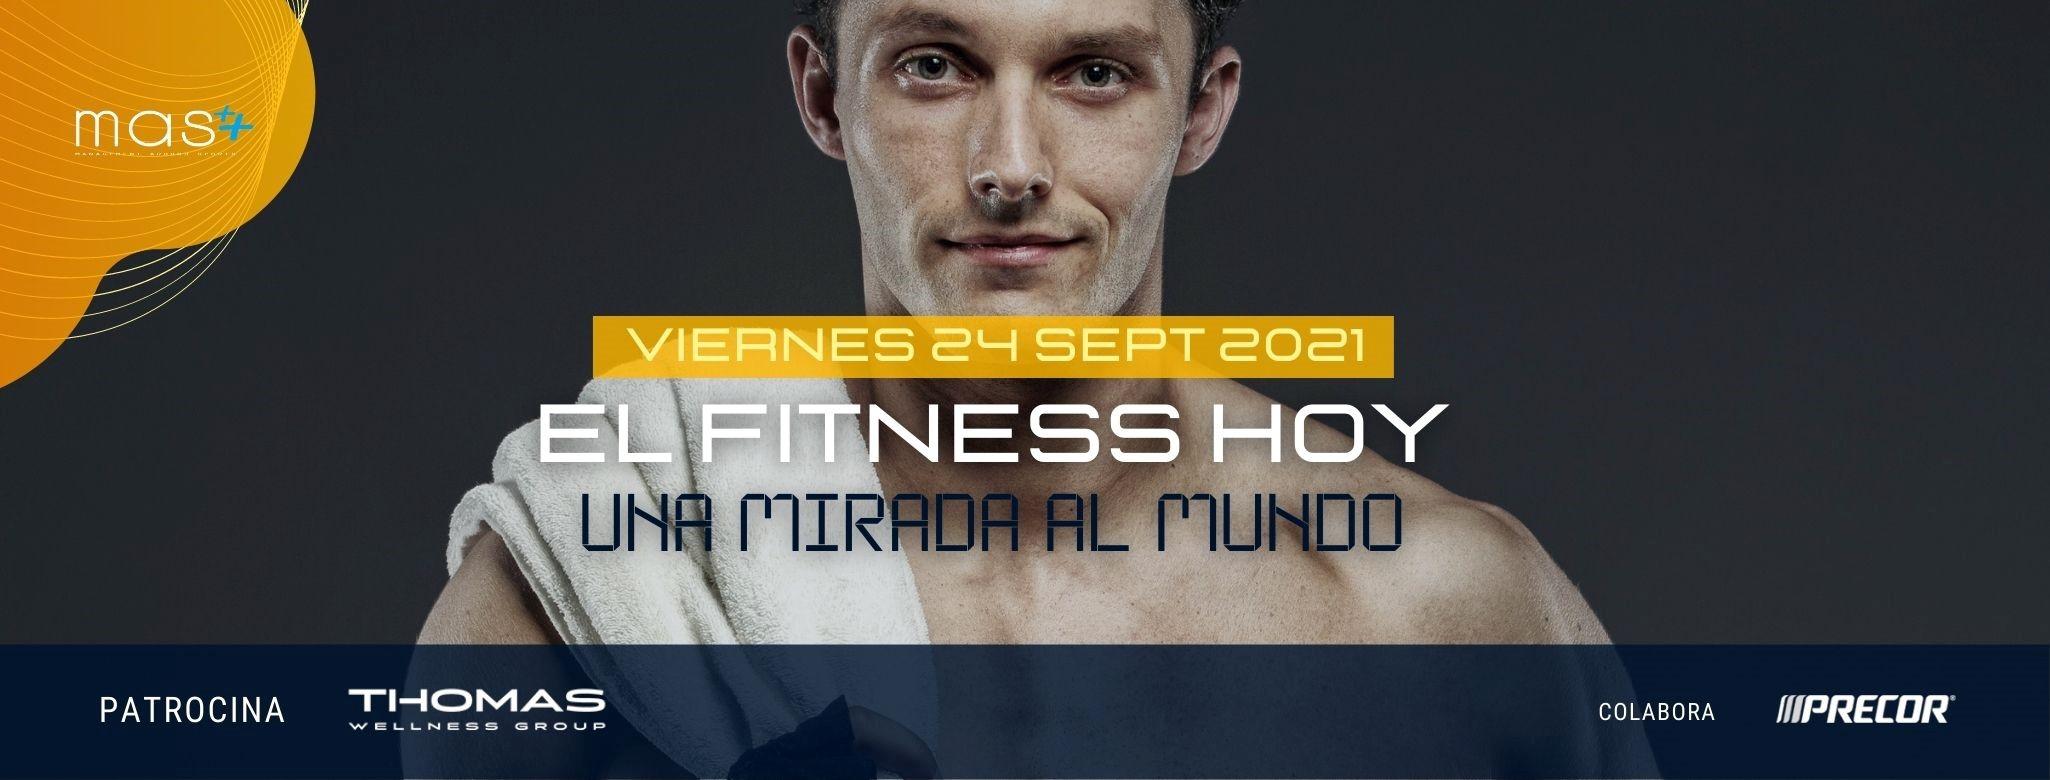 Thomas Wellness Group será patrocinador principal de 'El Fitness hoy'